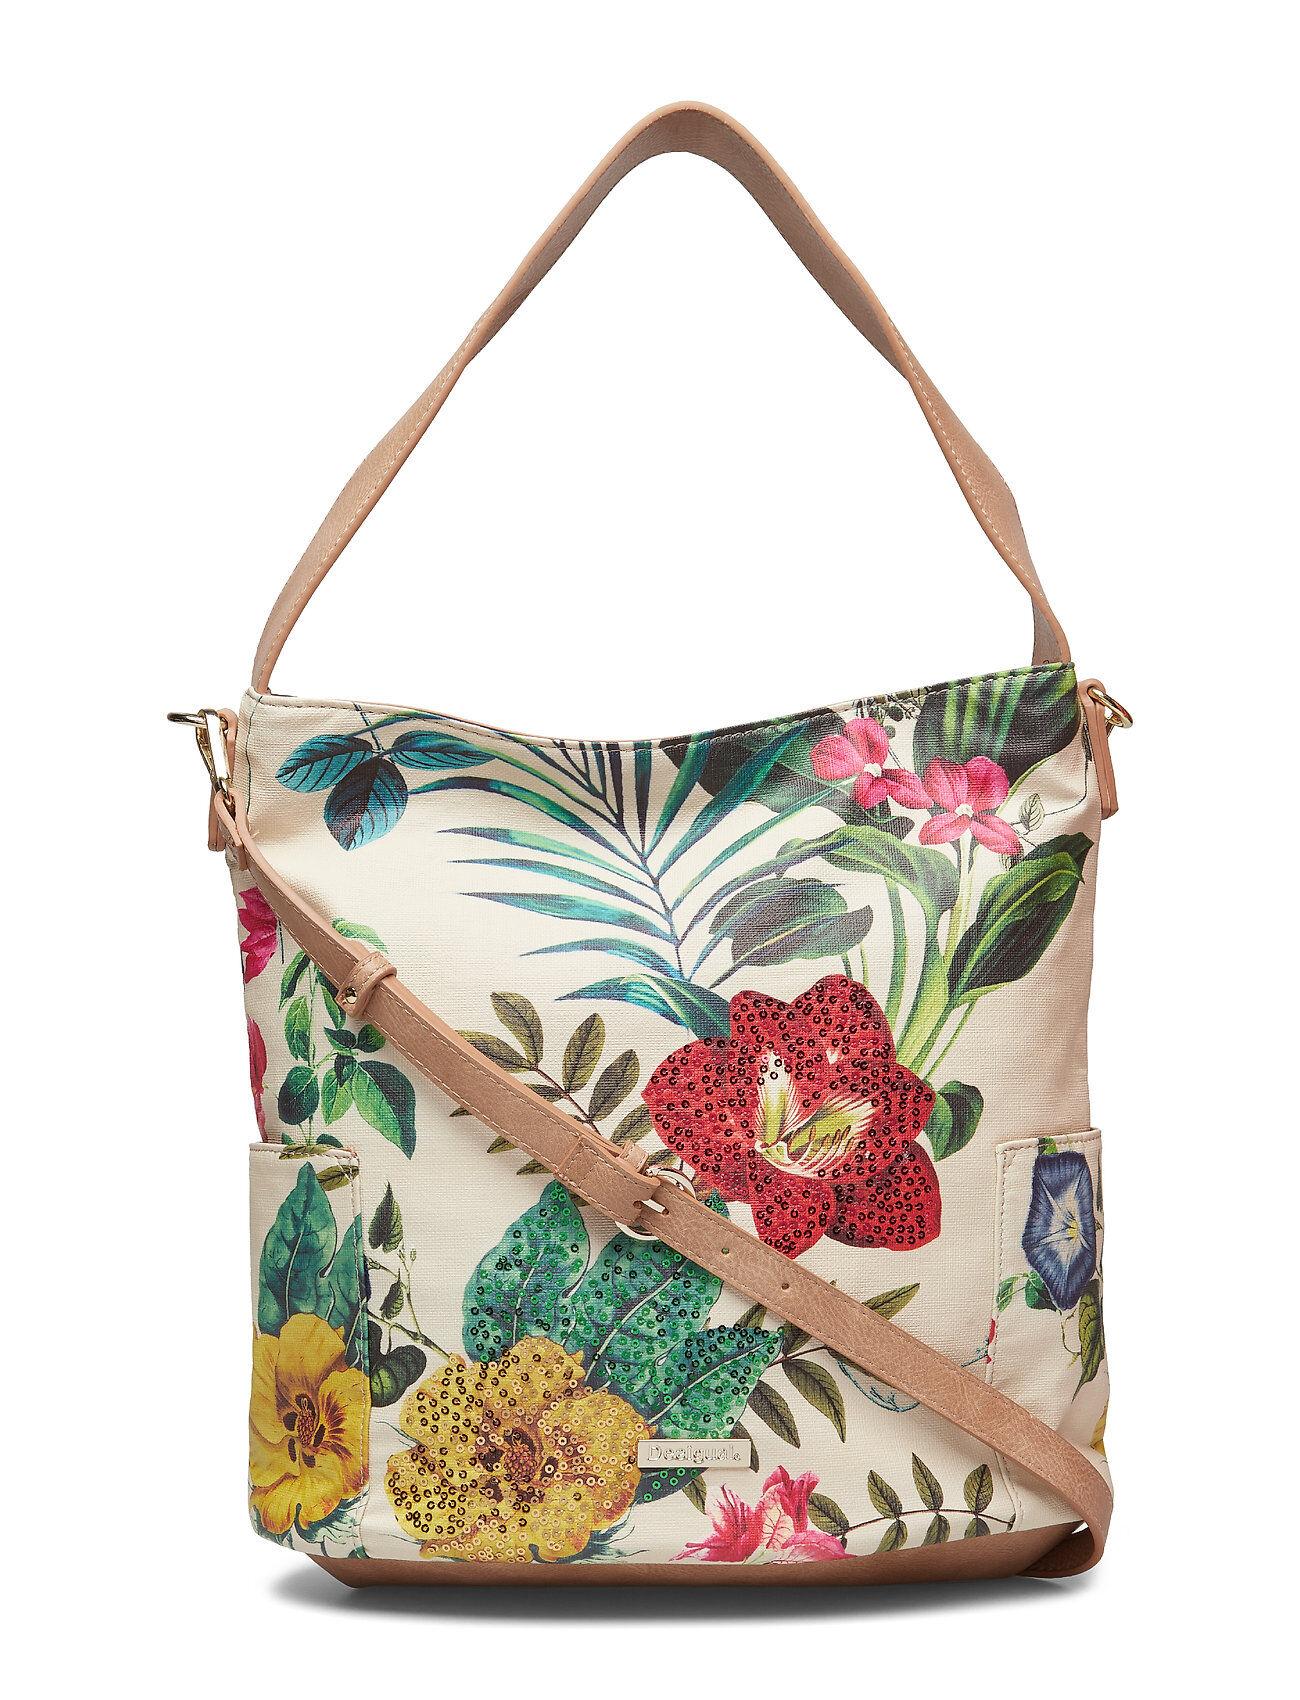 Desigual Accessories Bols Clio Yakarta Mini Bags Top Handle Bags Monivärinen/Kuvioitu Desigual Accessories